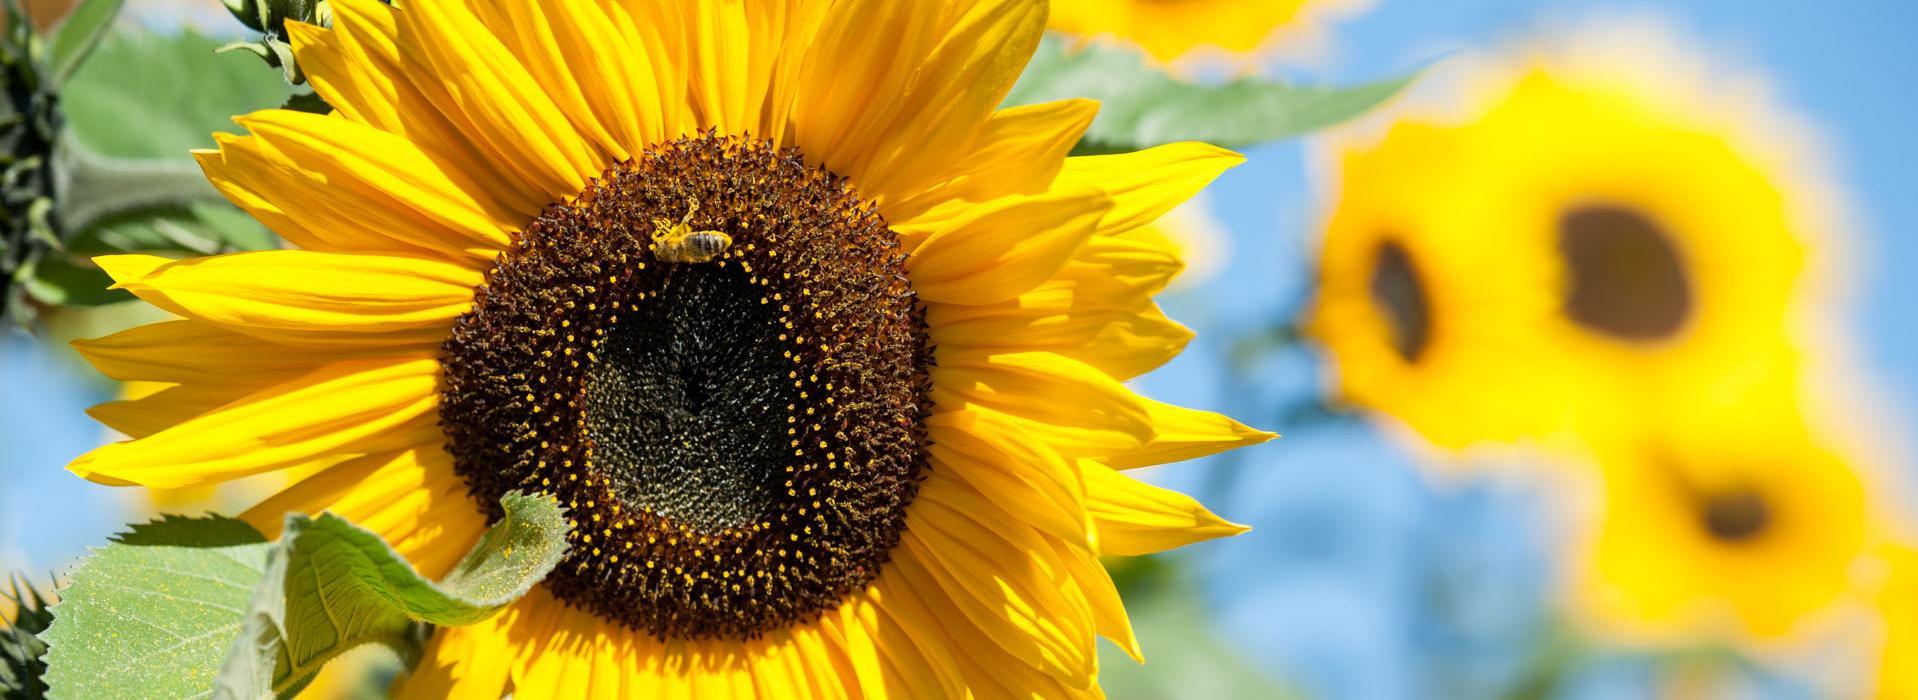 20150930_Sonnenblume_143_web.jpg